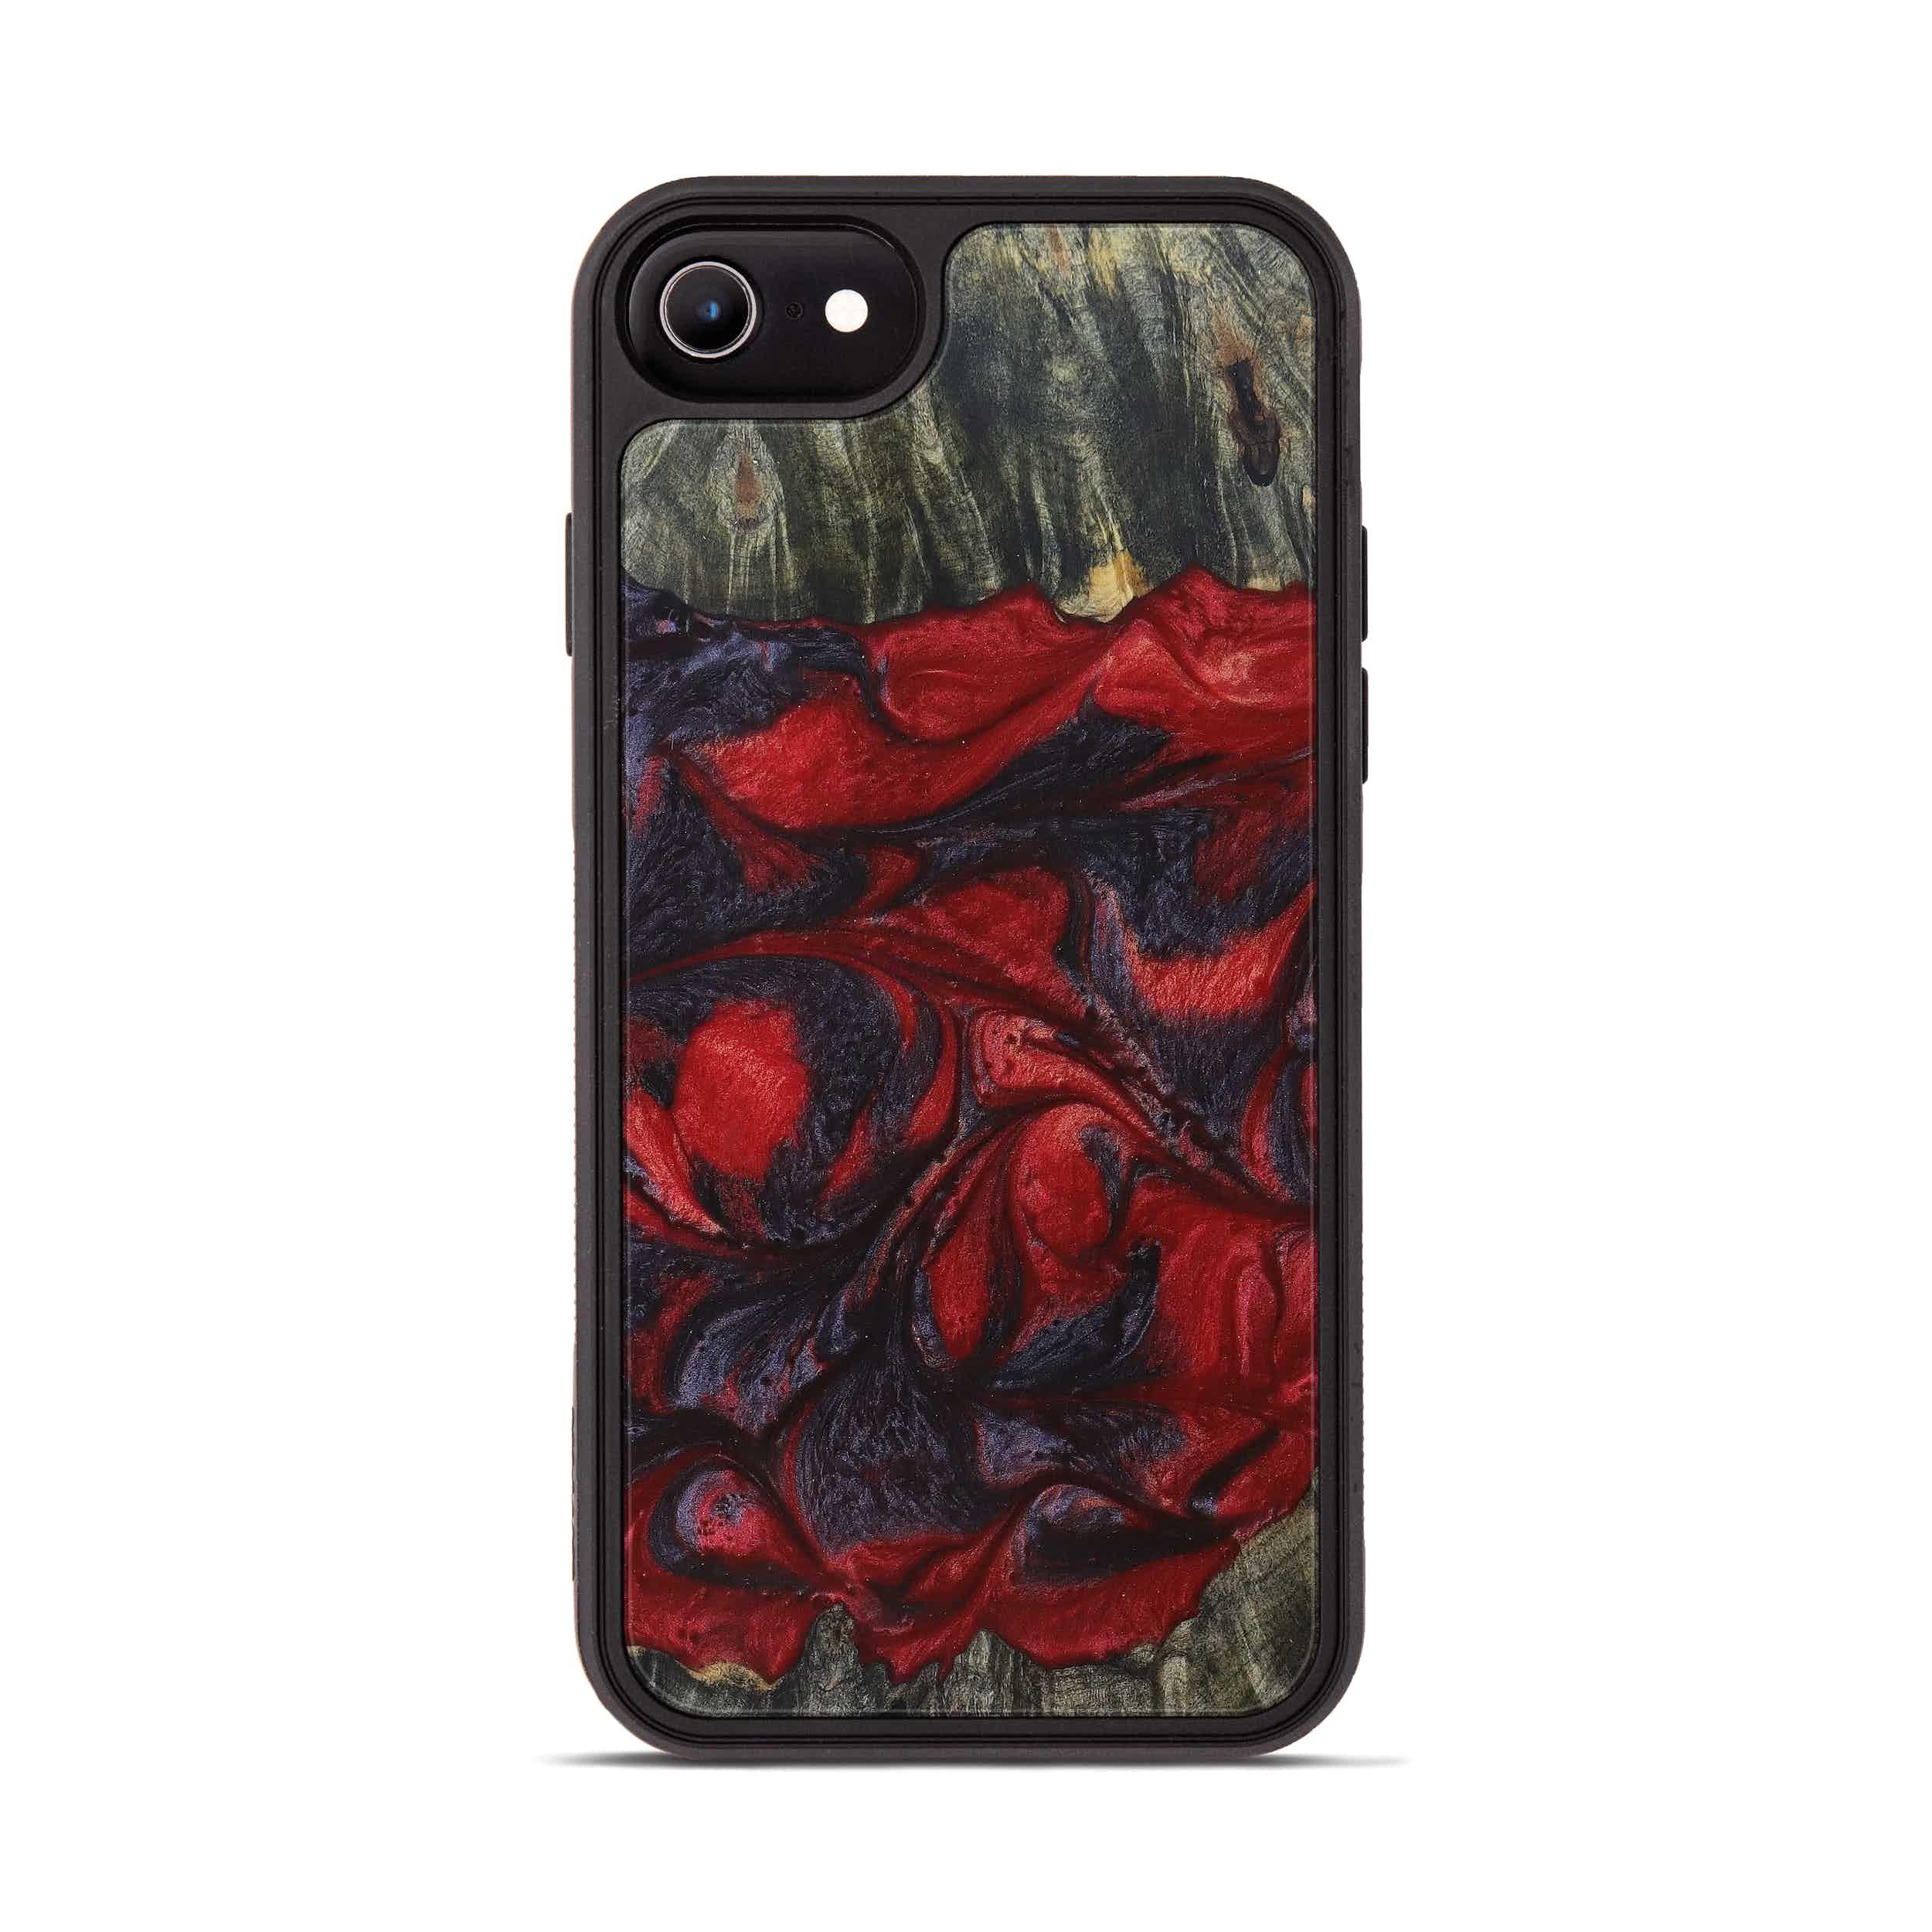 iPhone 8 Wood+Resin Phone Case - Constancia (Dark Red, 394321)